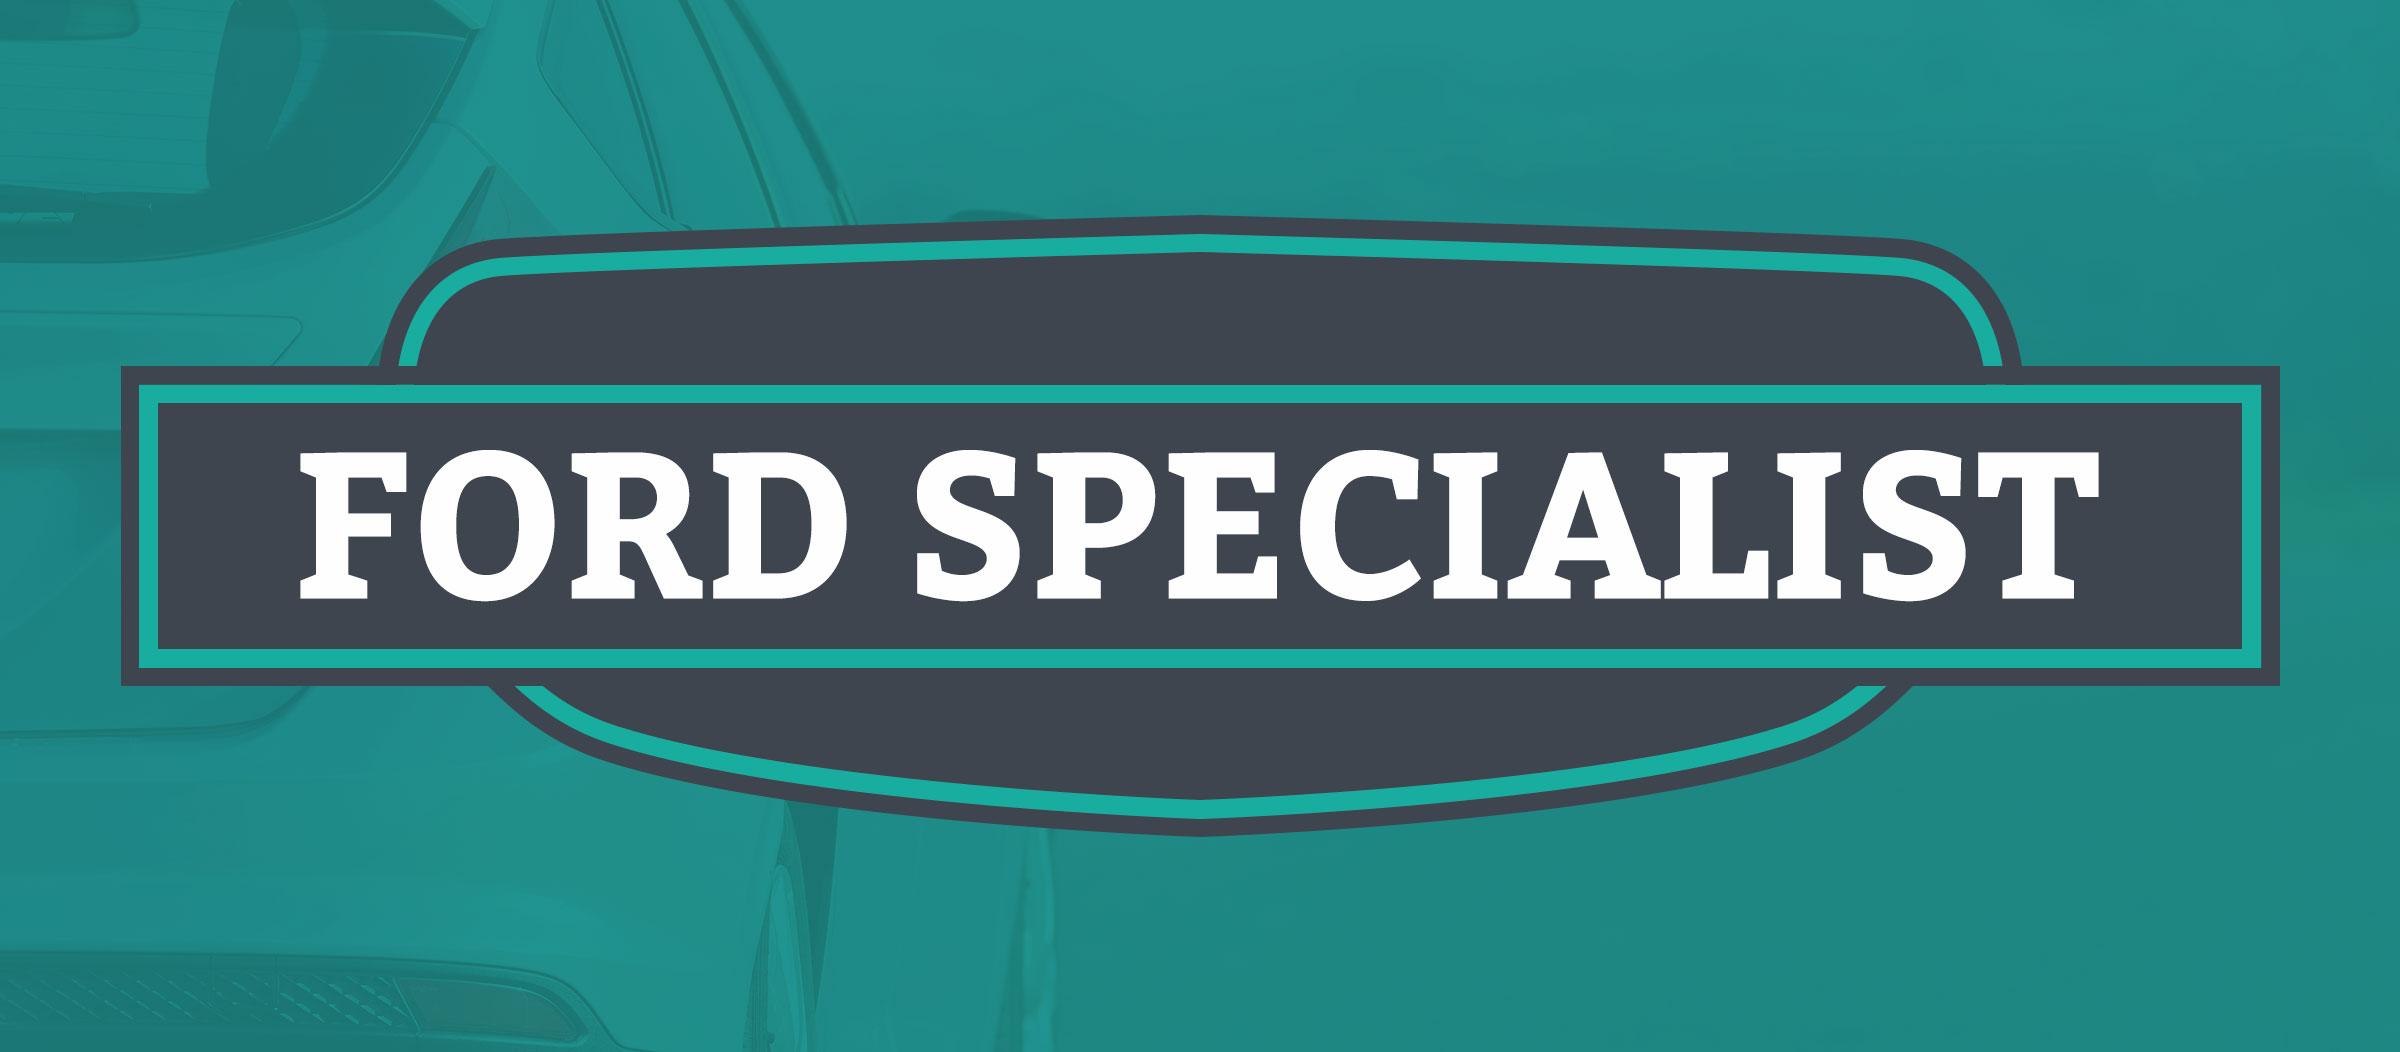 Ford Specialist - CJ Auto